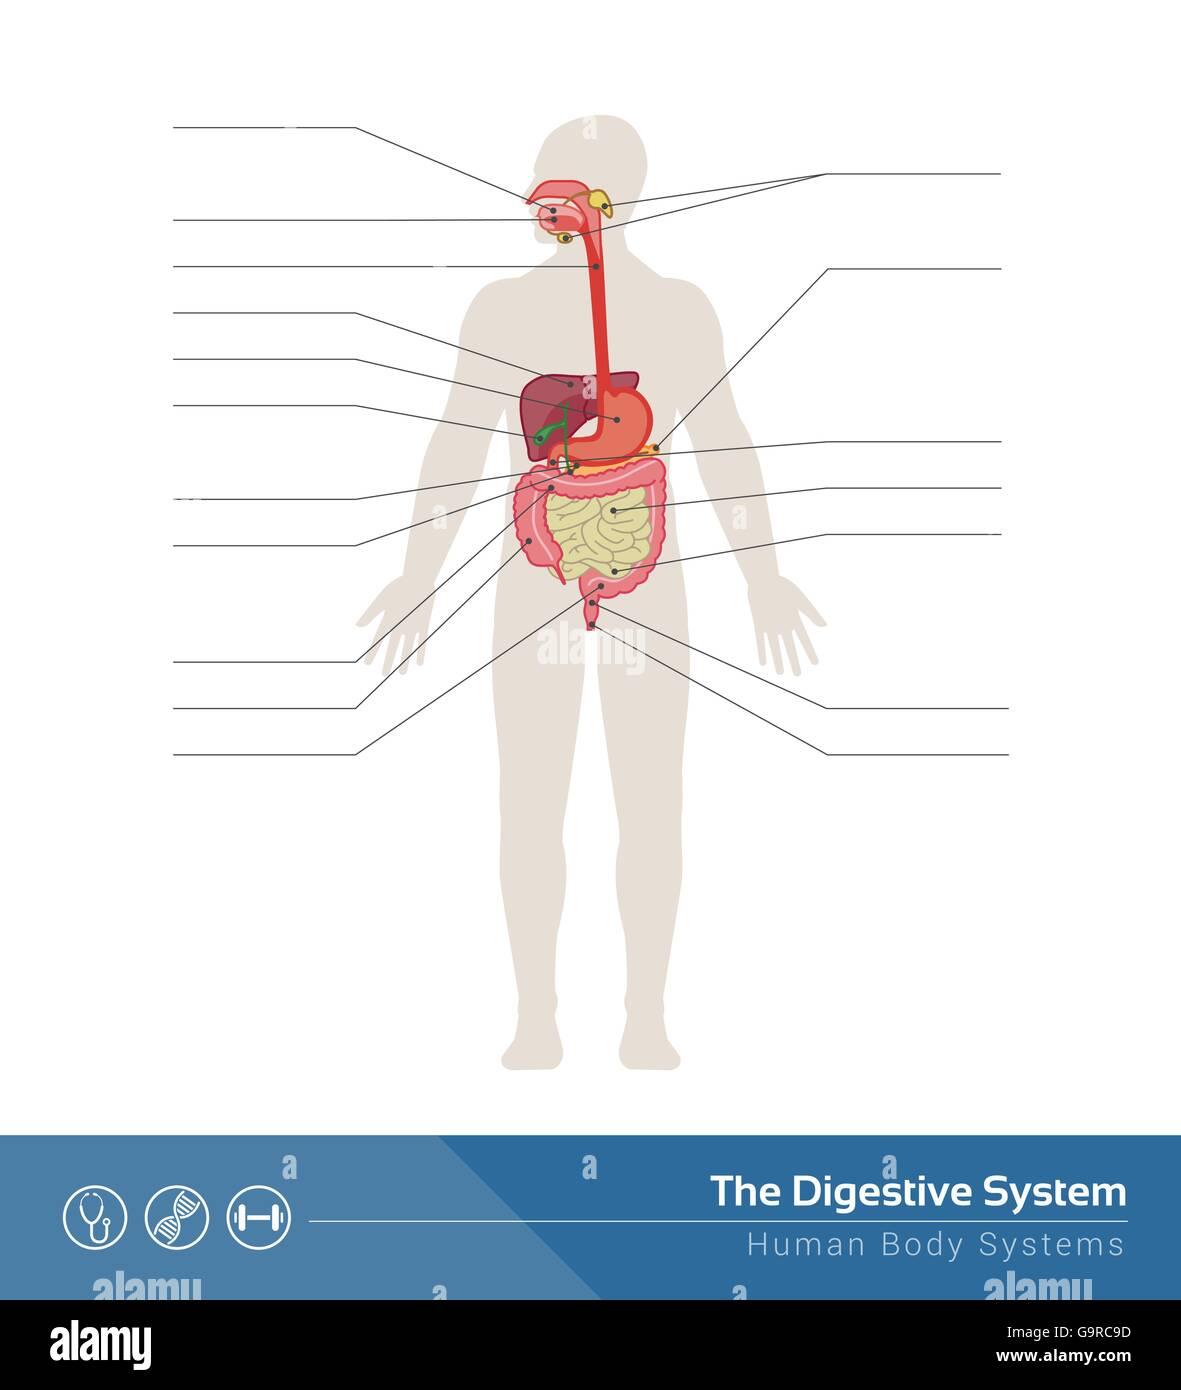 Digestive System Diagram Stockfotos & Digestive System Diagram ...